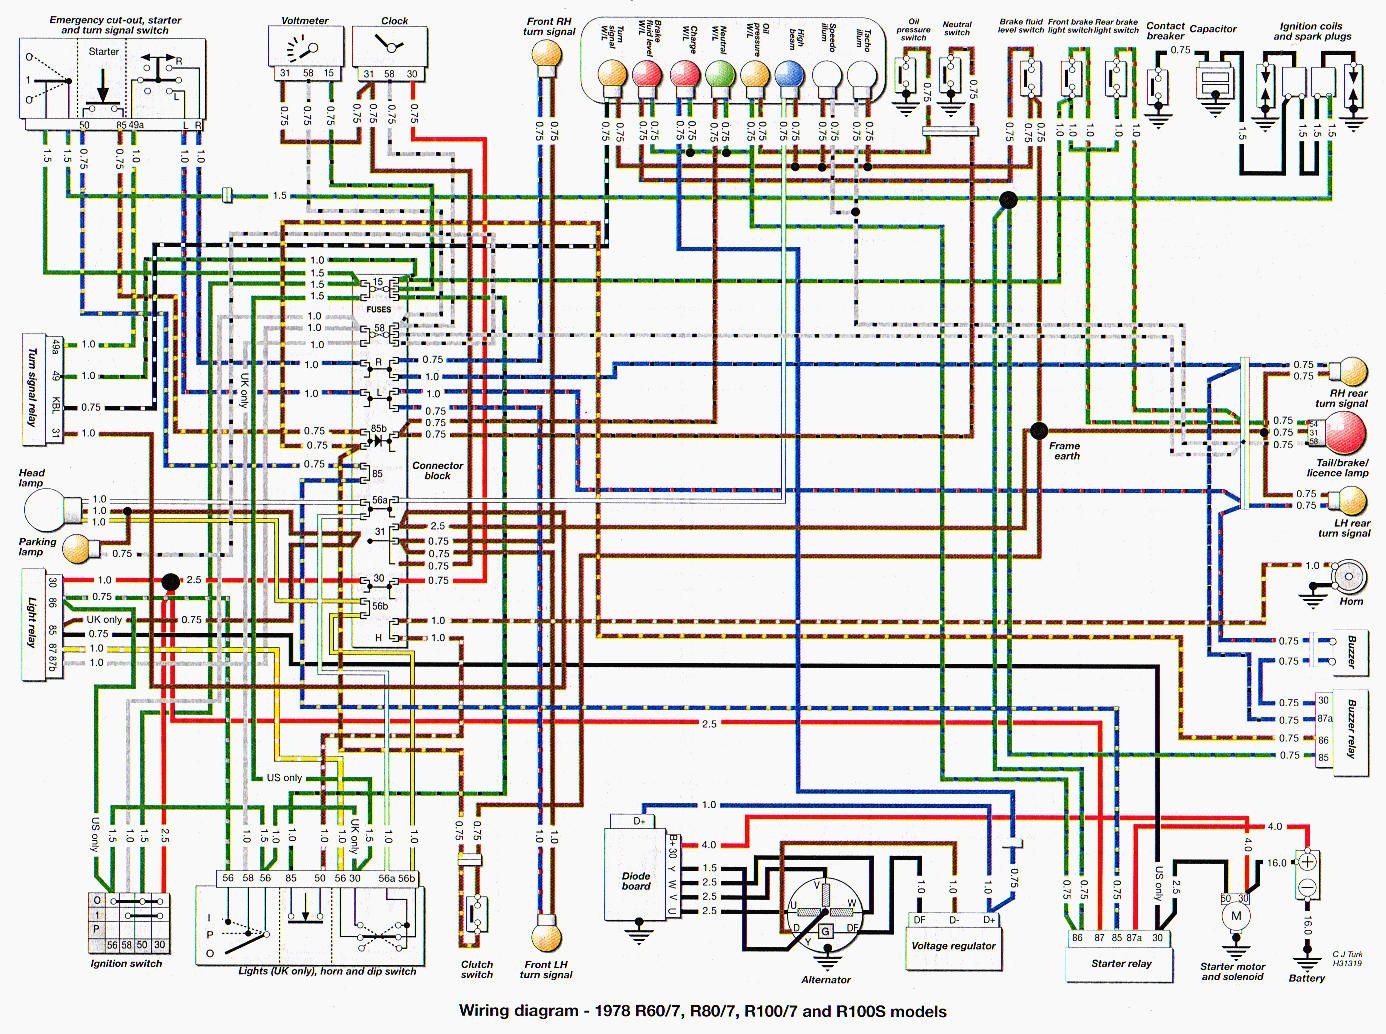 Groovy Bmw Hp2 Wiring Diagram Wiring Diagram Library Wiring Cloud Faunaidewilluminateatxorg